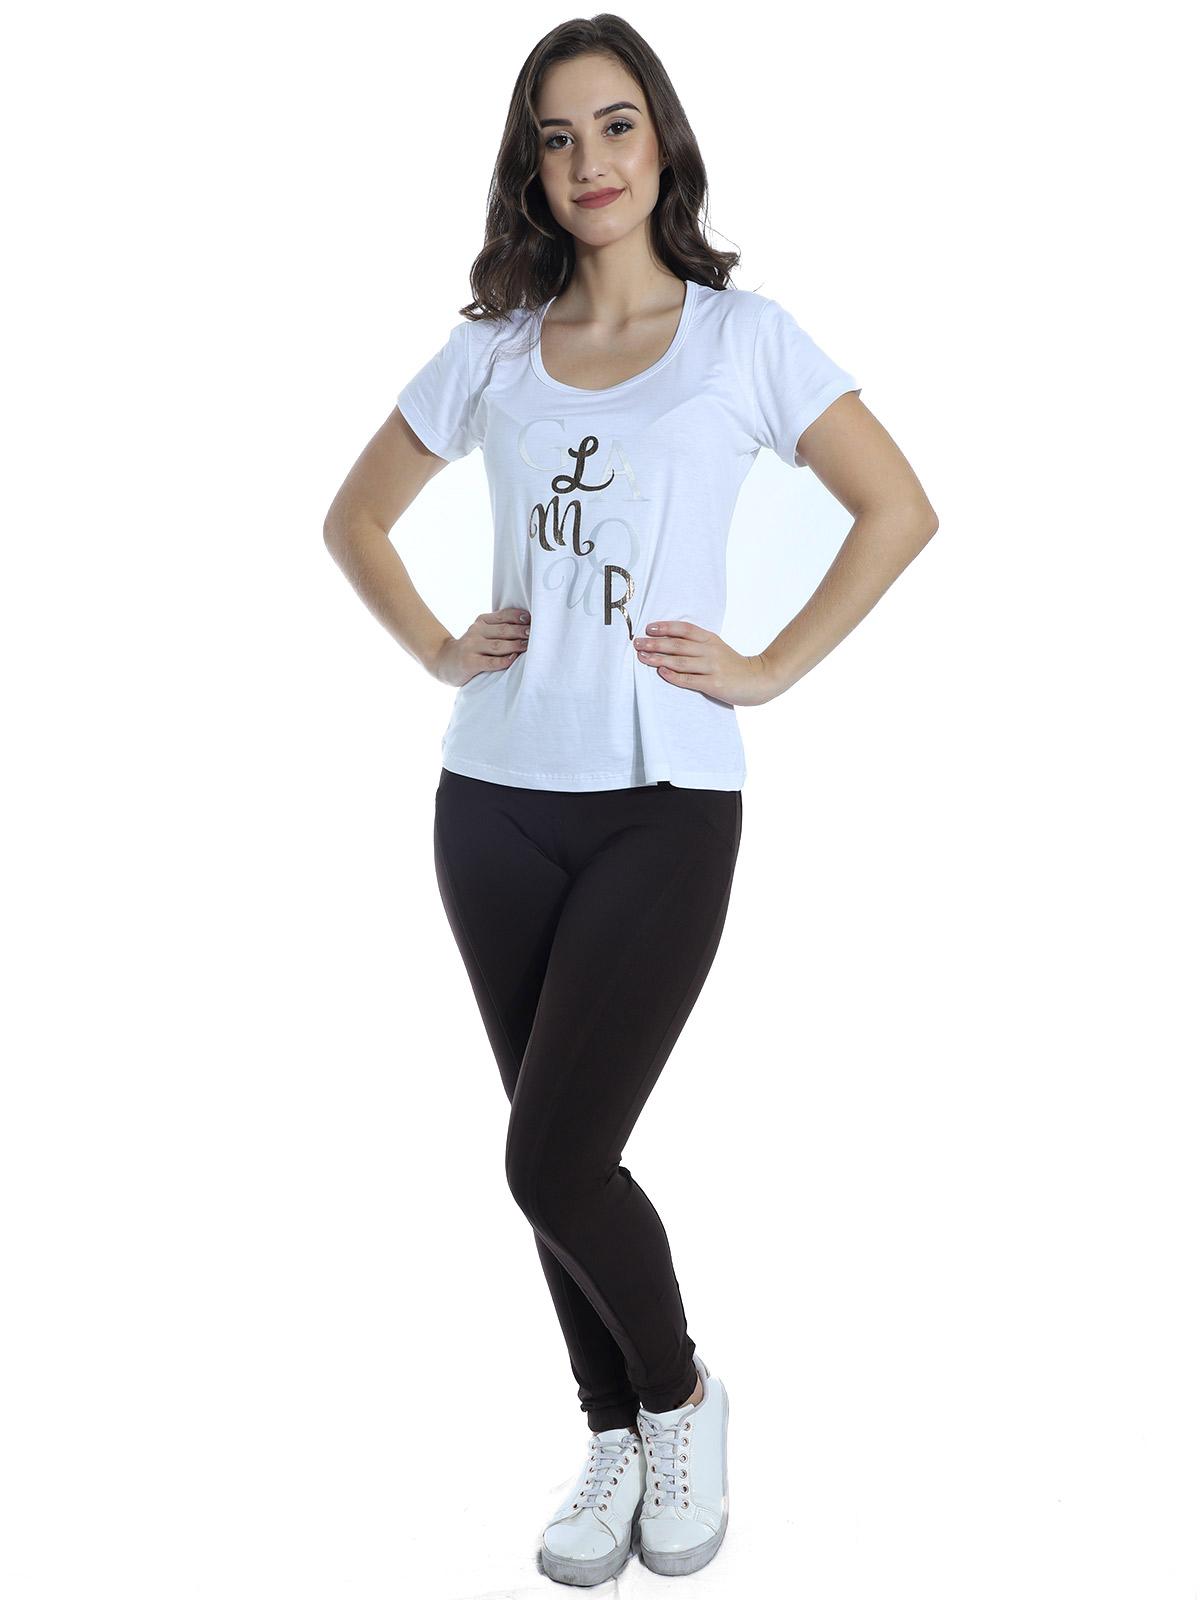 Calça Montaria Legging Feminina Fitness Body Fit Marrom